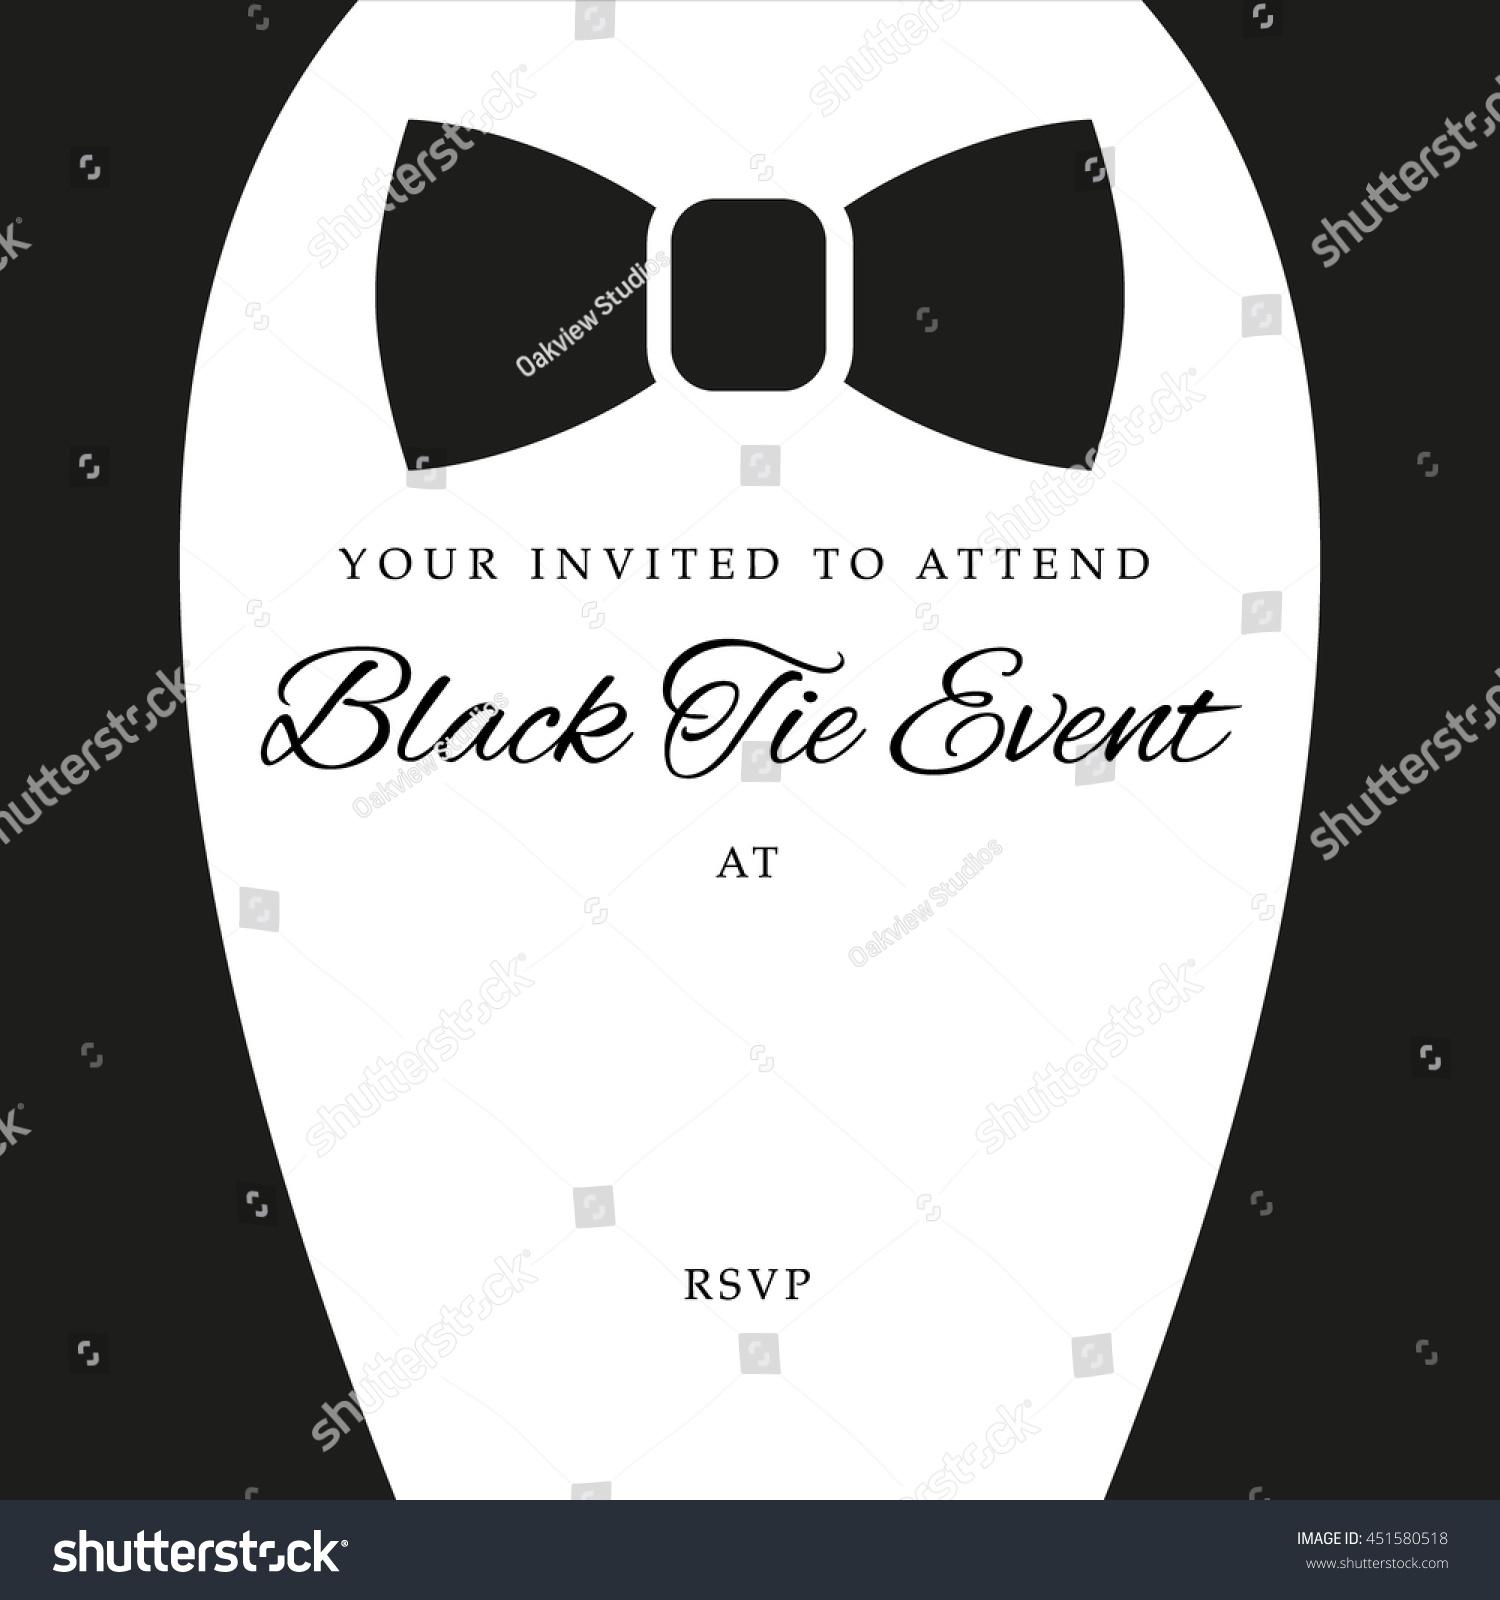 black tie event invite template vector のベクター画像素材